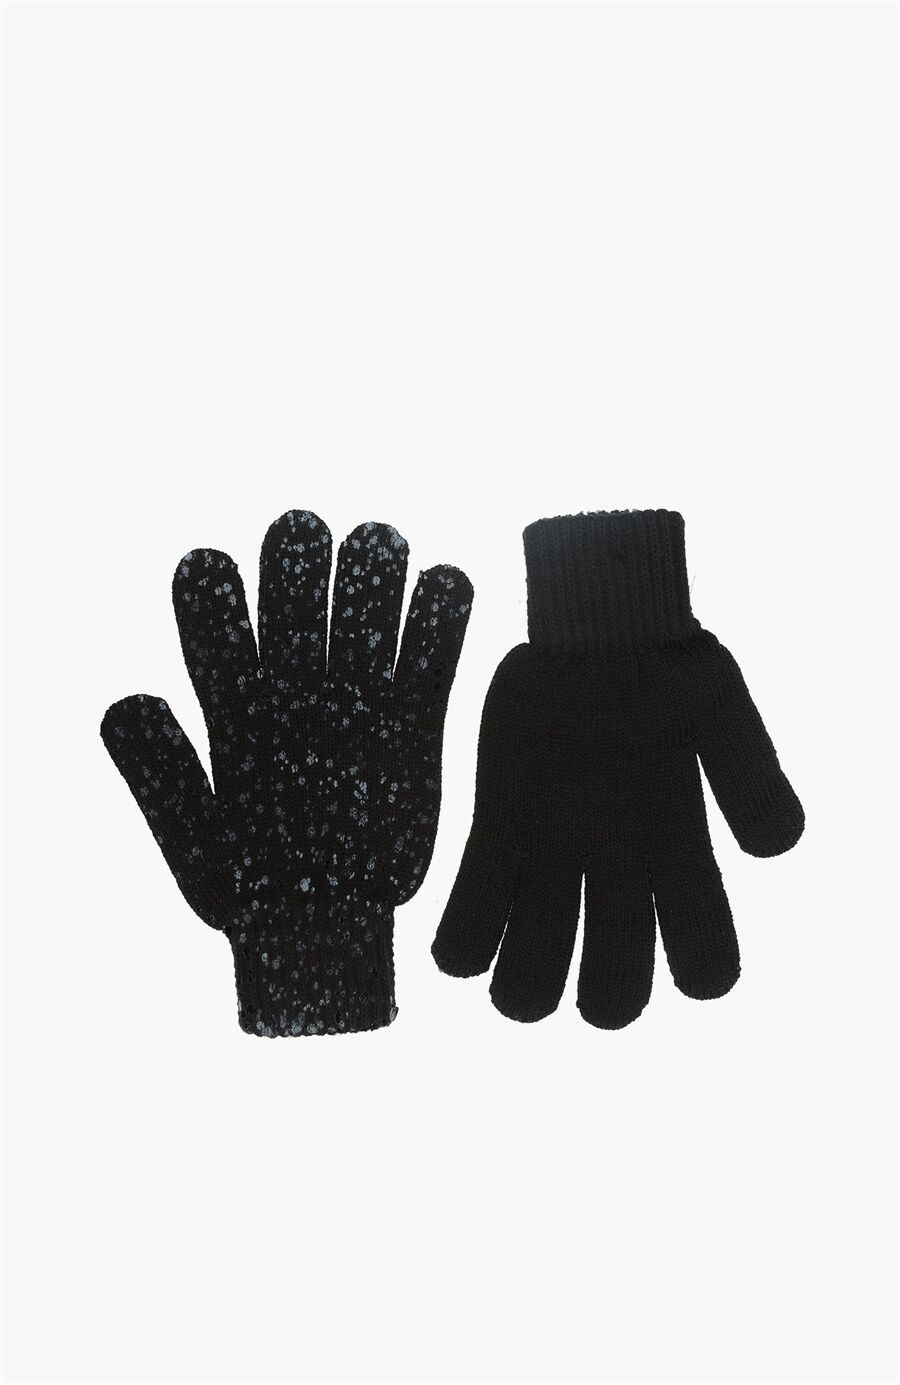 Taşlı Siyah Kadın Eldiven